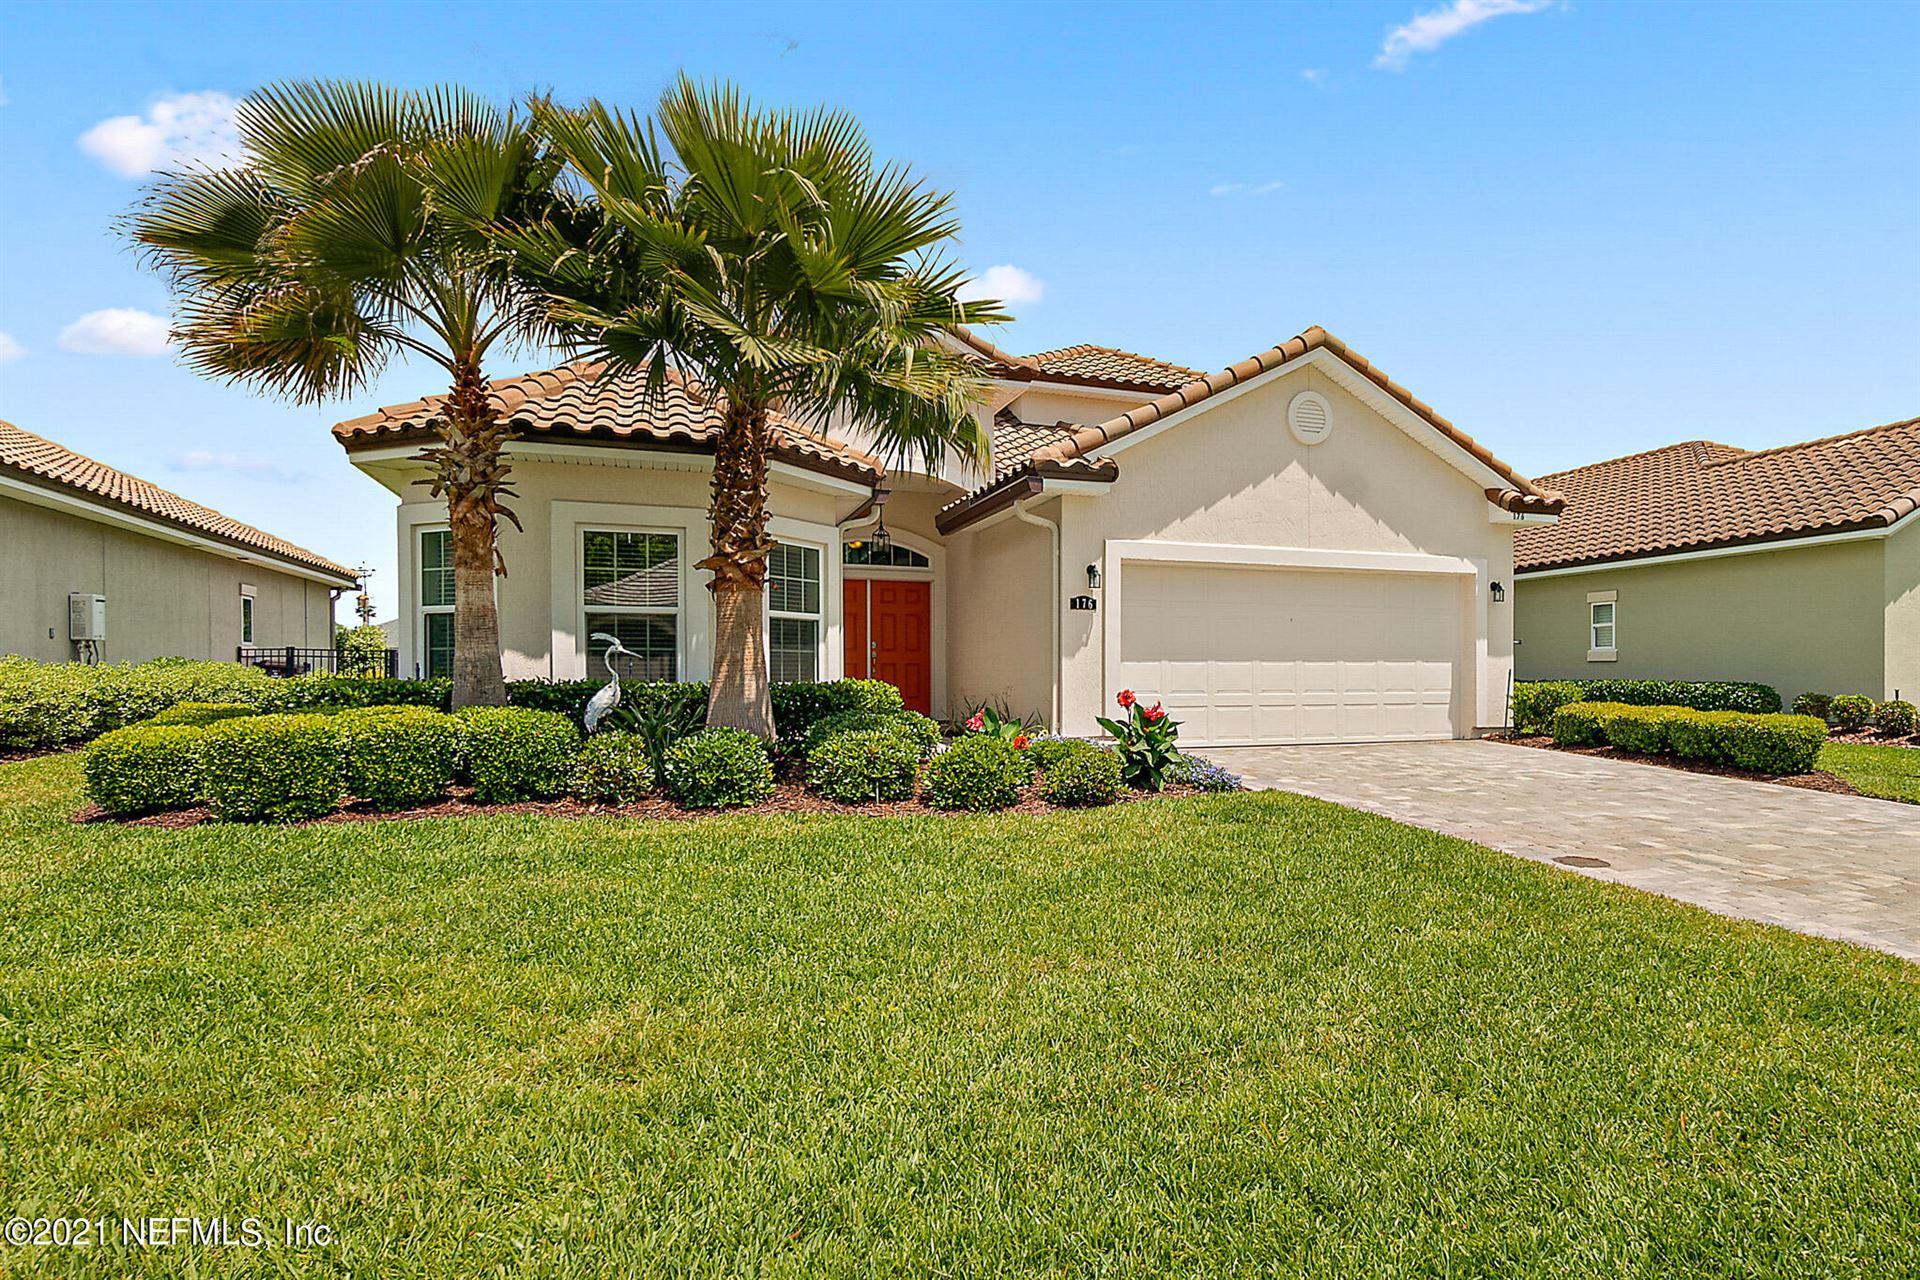 176 PORTADA DR, Saint Augustine, FL 32095 - MLS#: 1107841